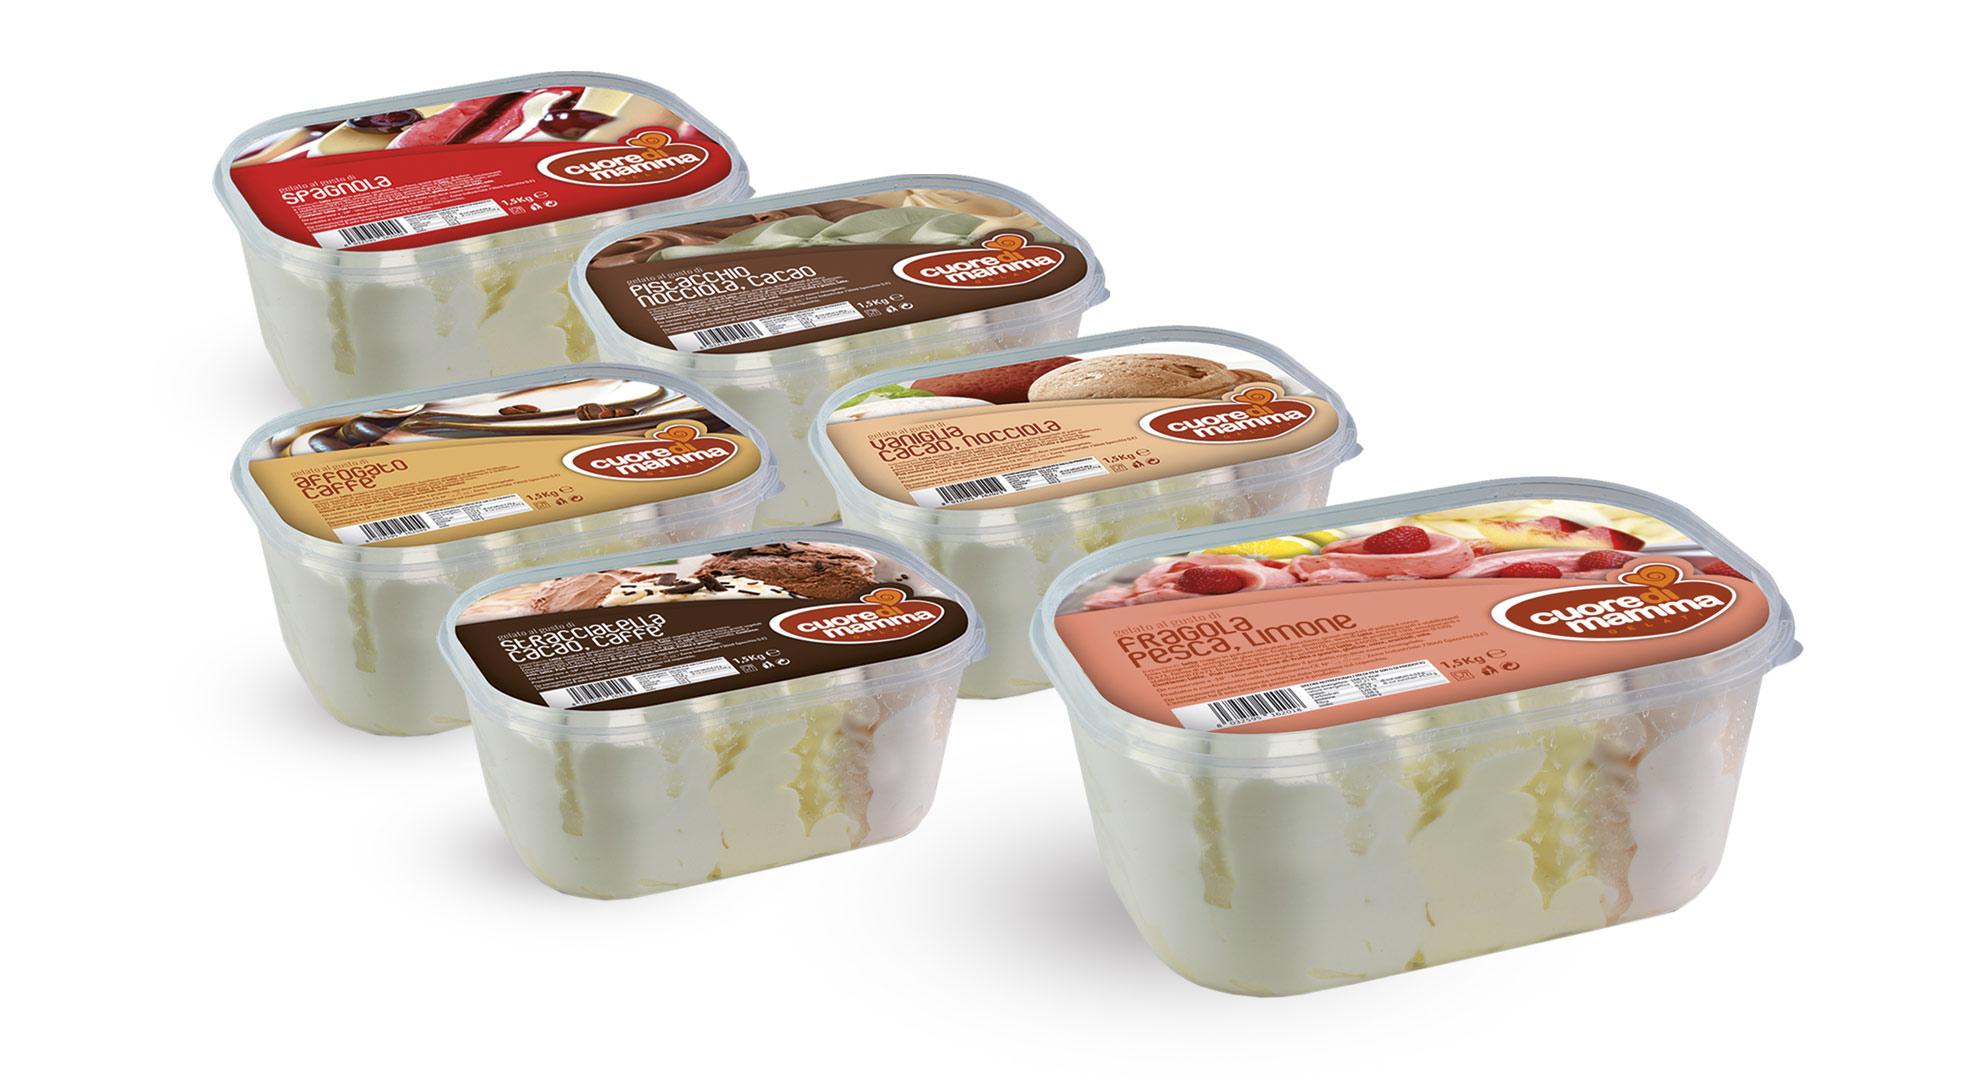 Vaschette gelato da 1500 g